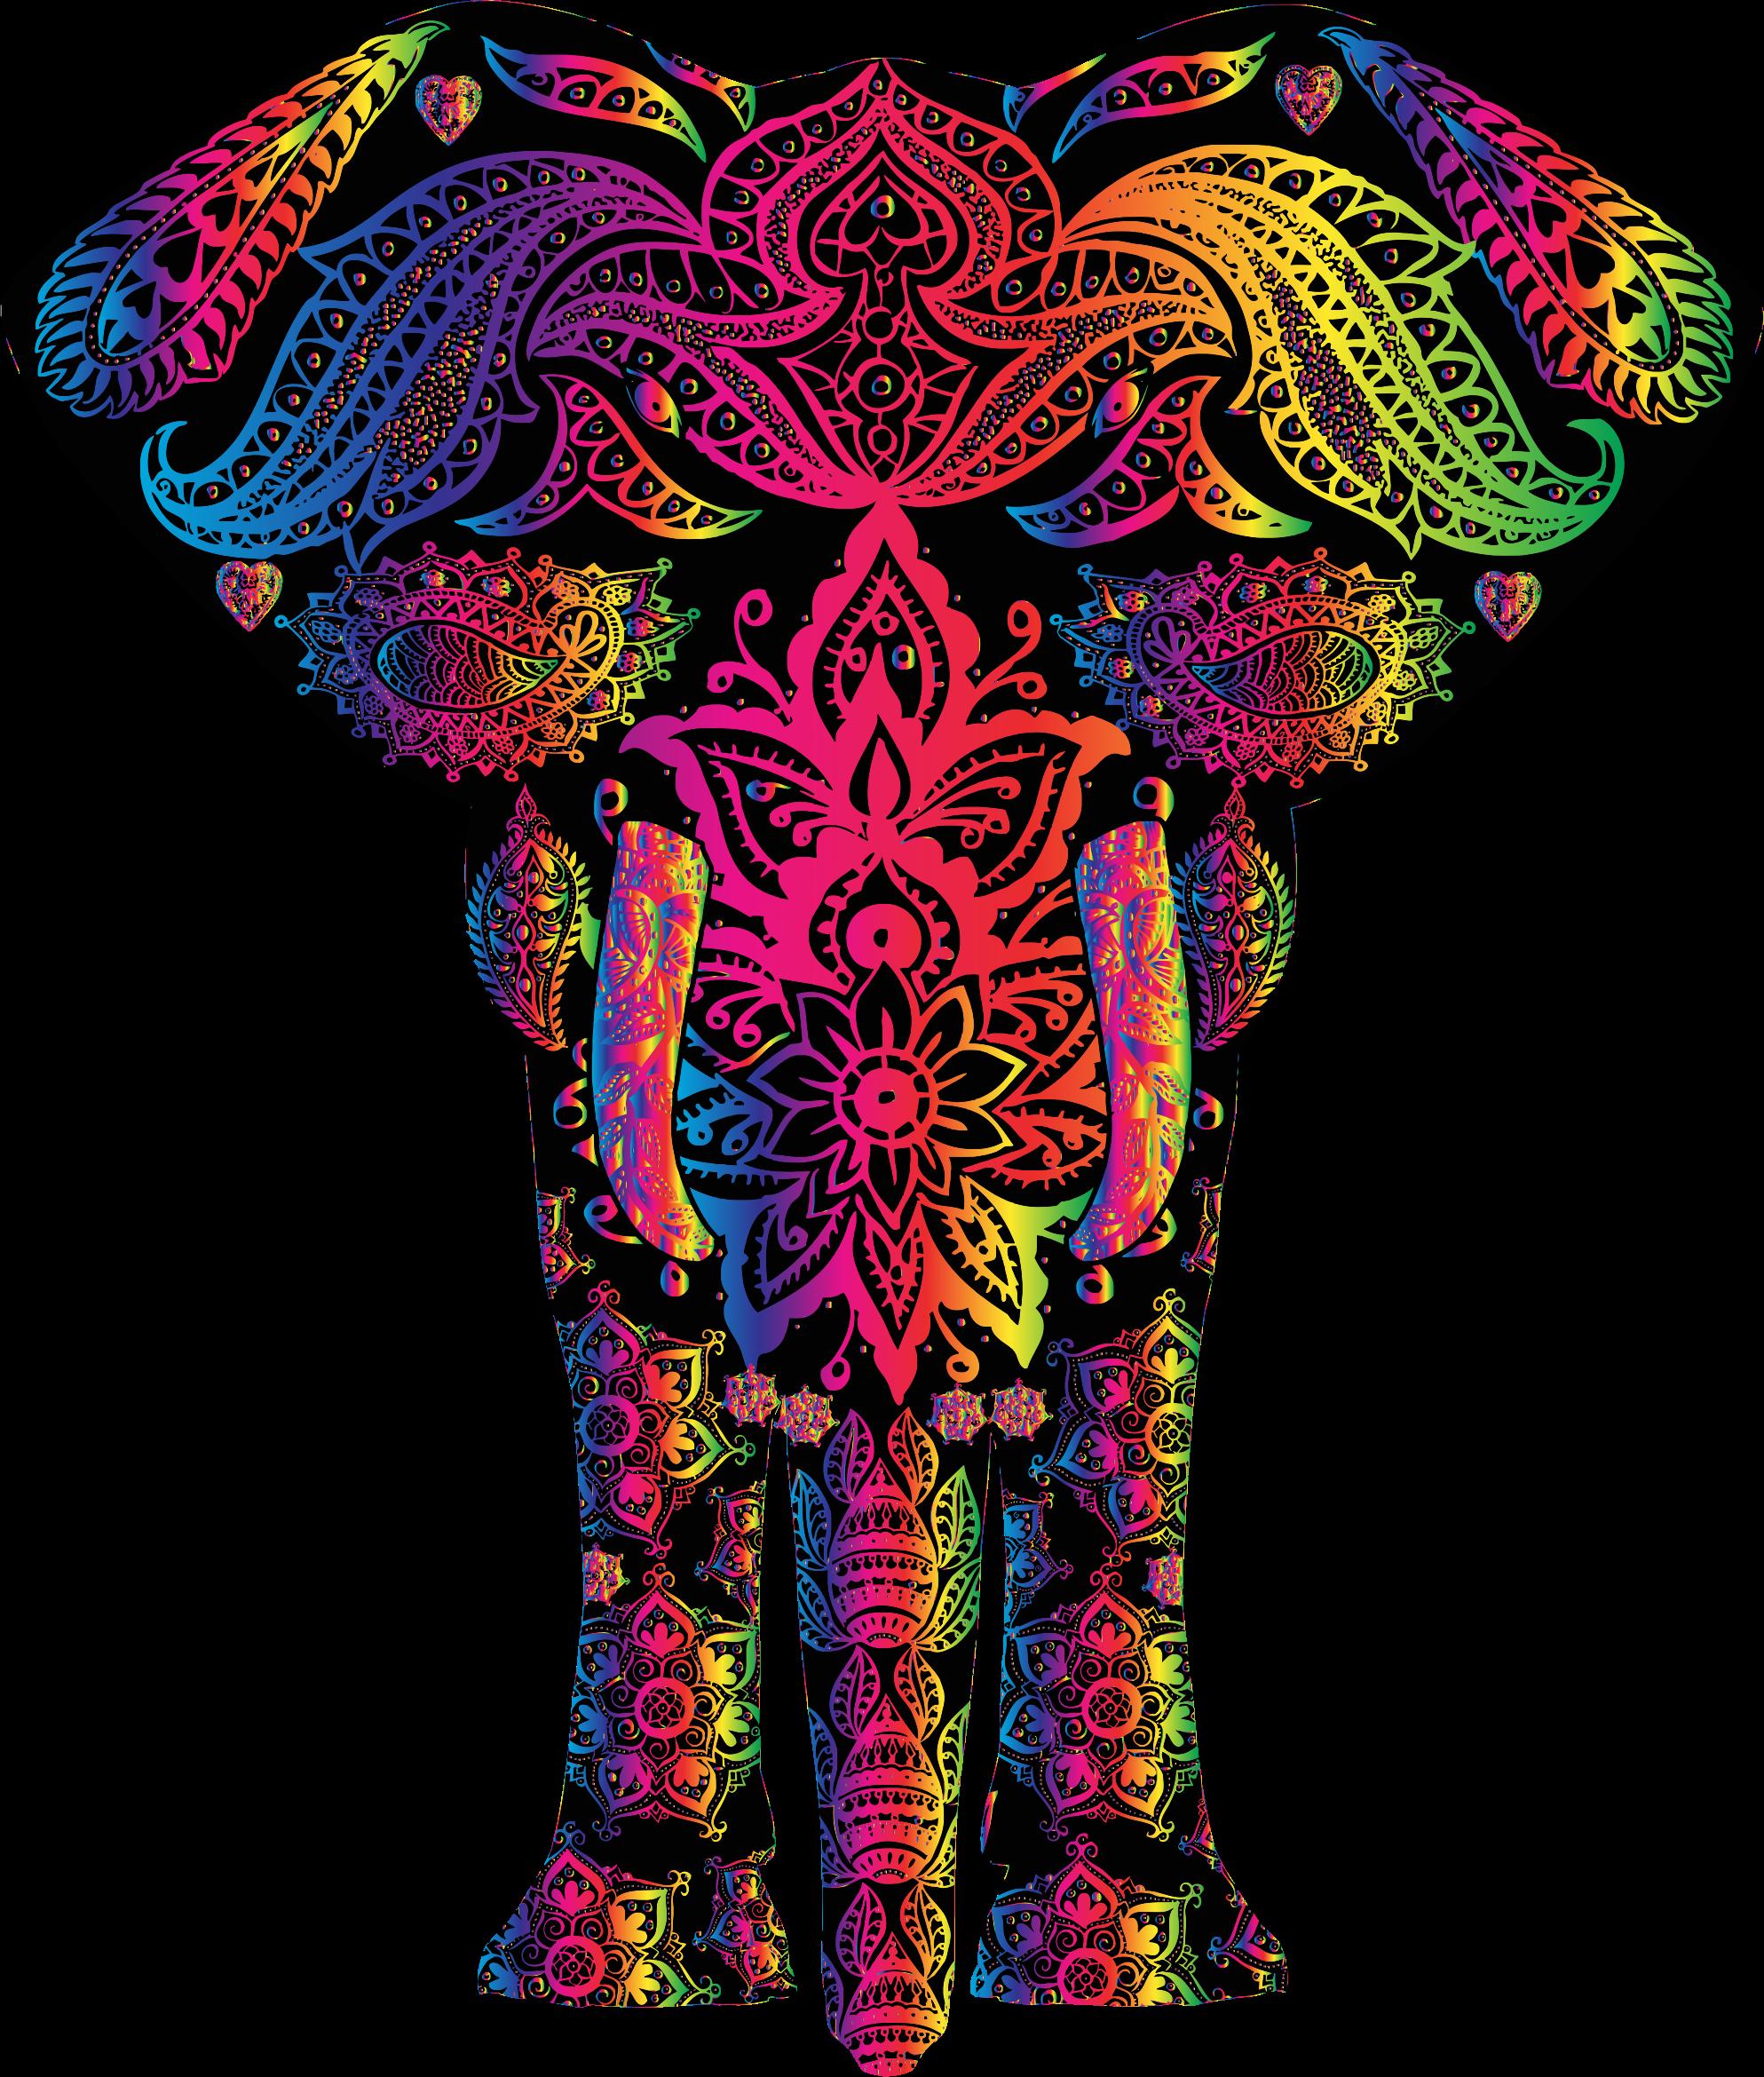 Clipart elephant rainbow. Floral pattern big image